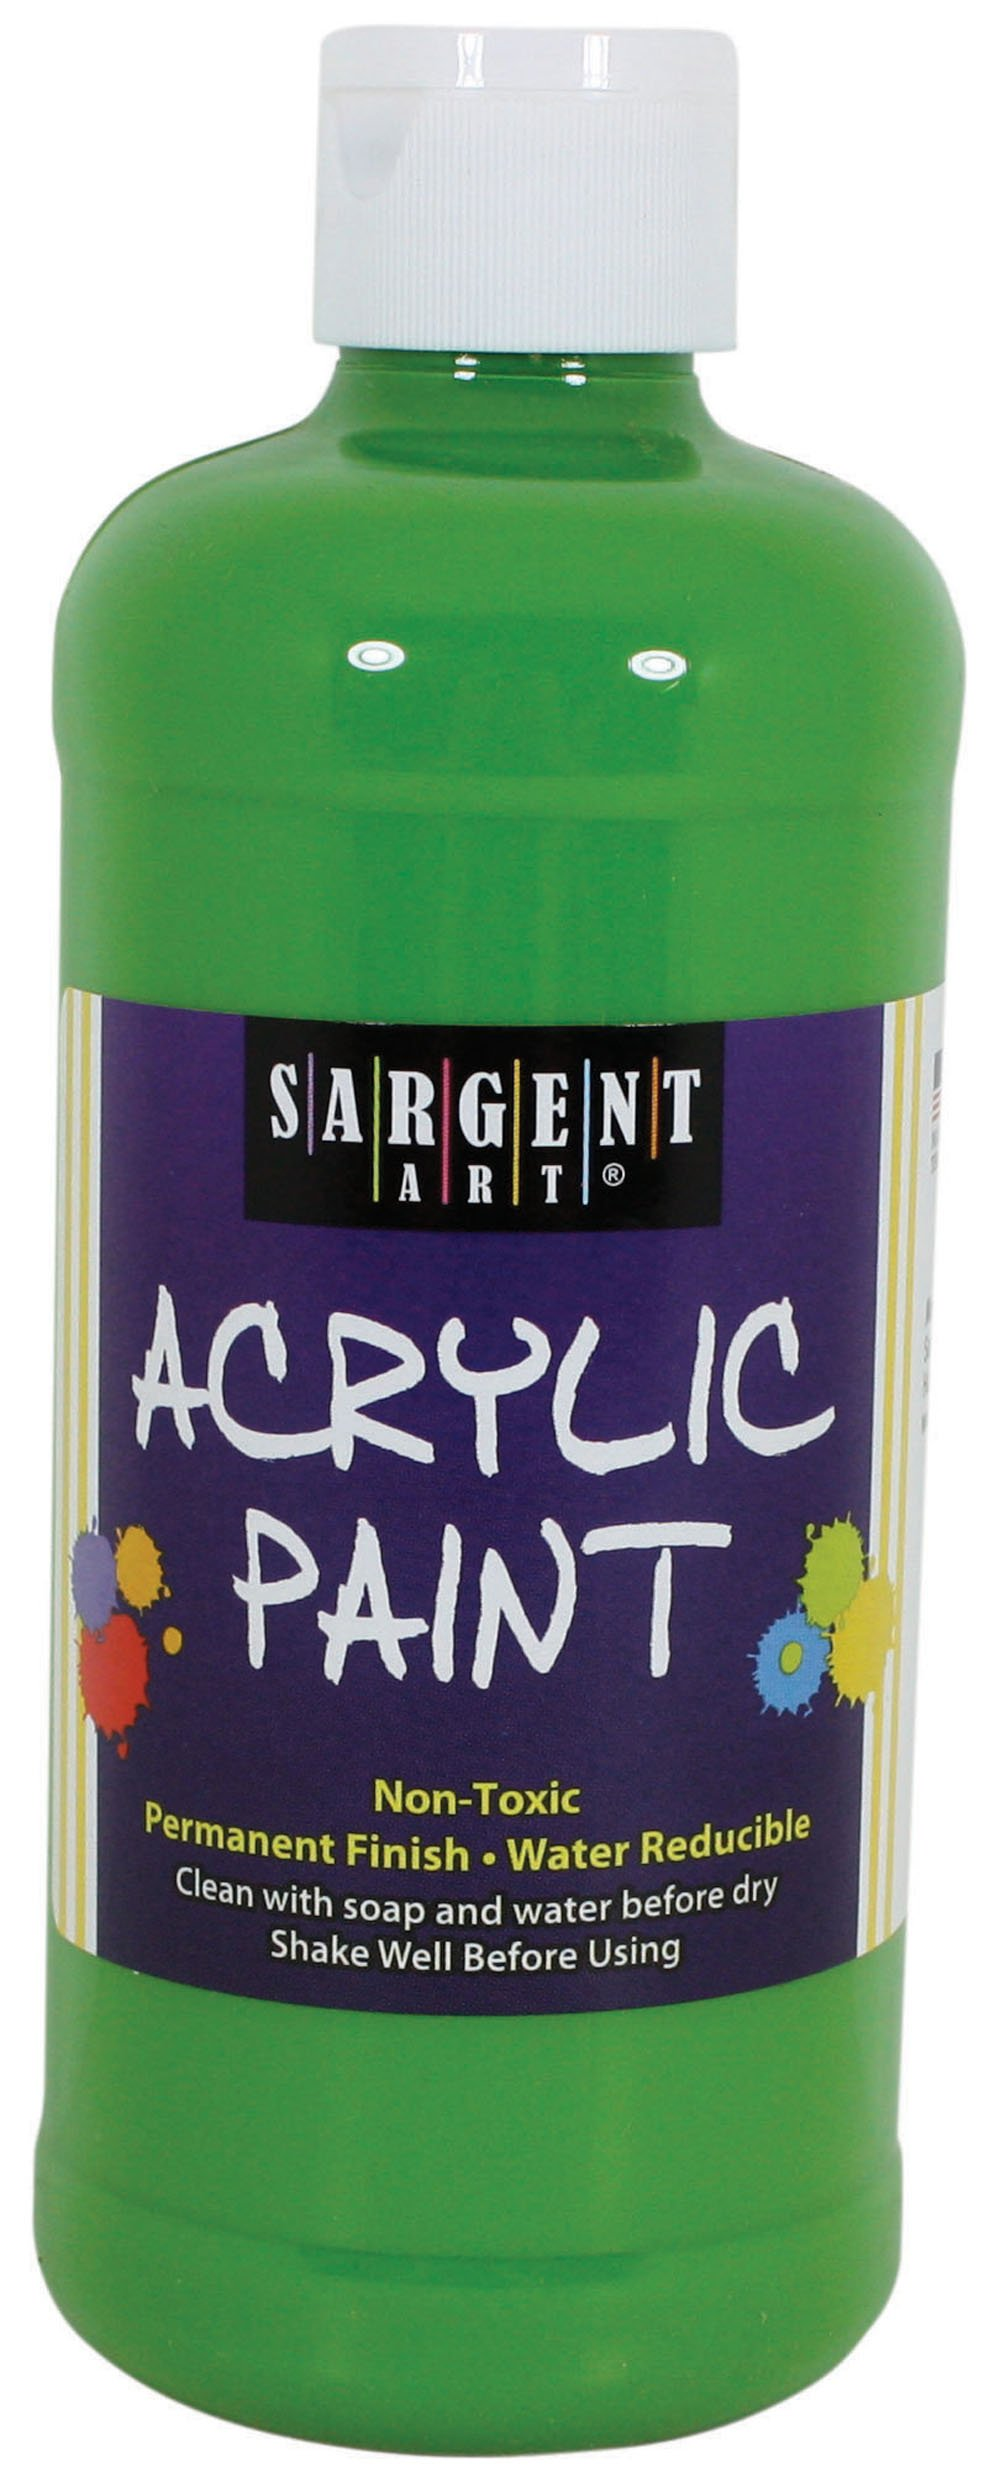 Sargent Art 24-2465 16-Ounce Acrylic Paint, Light Green